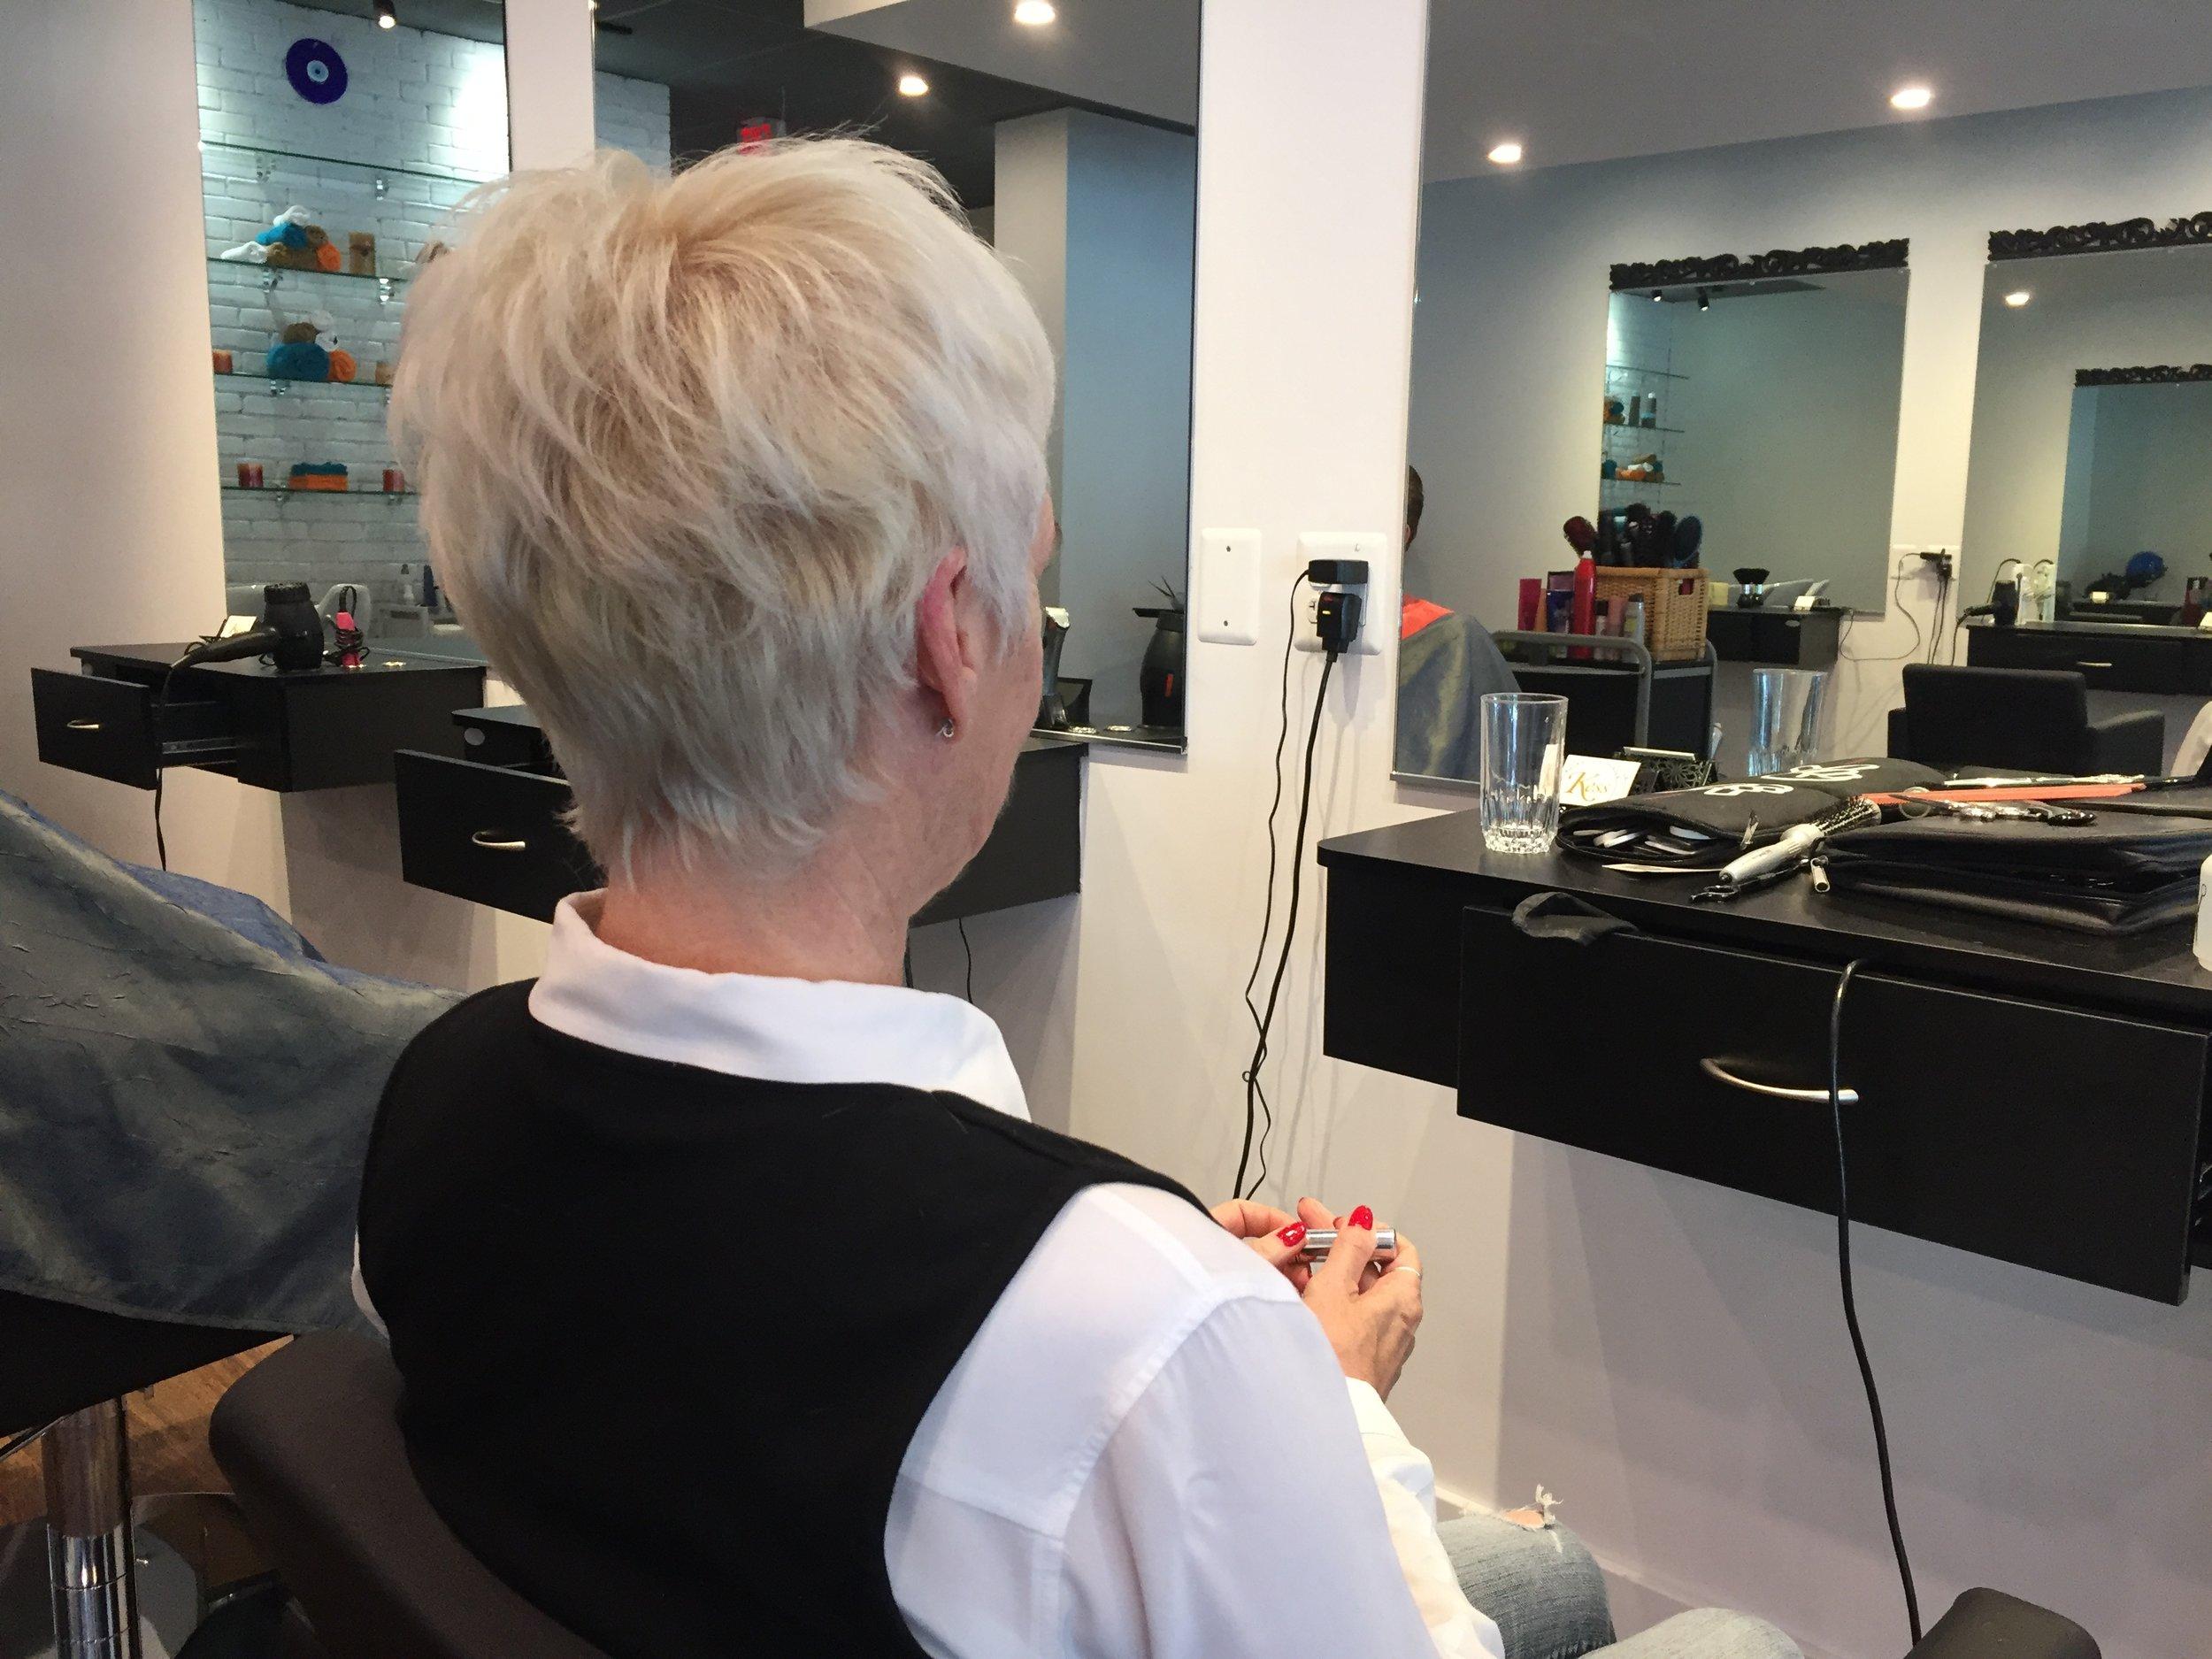 Full head highlights and haircut - Final look